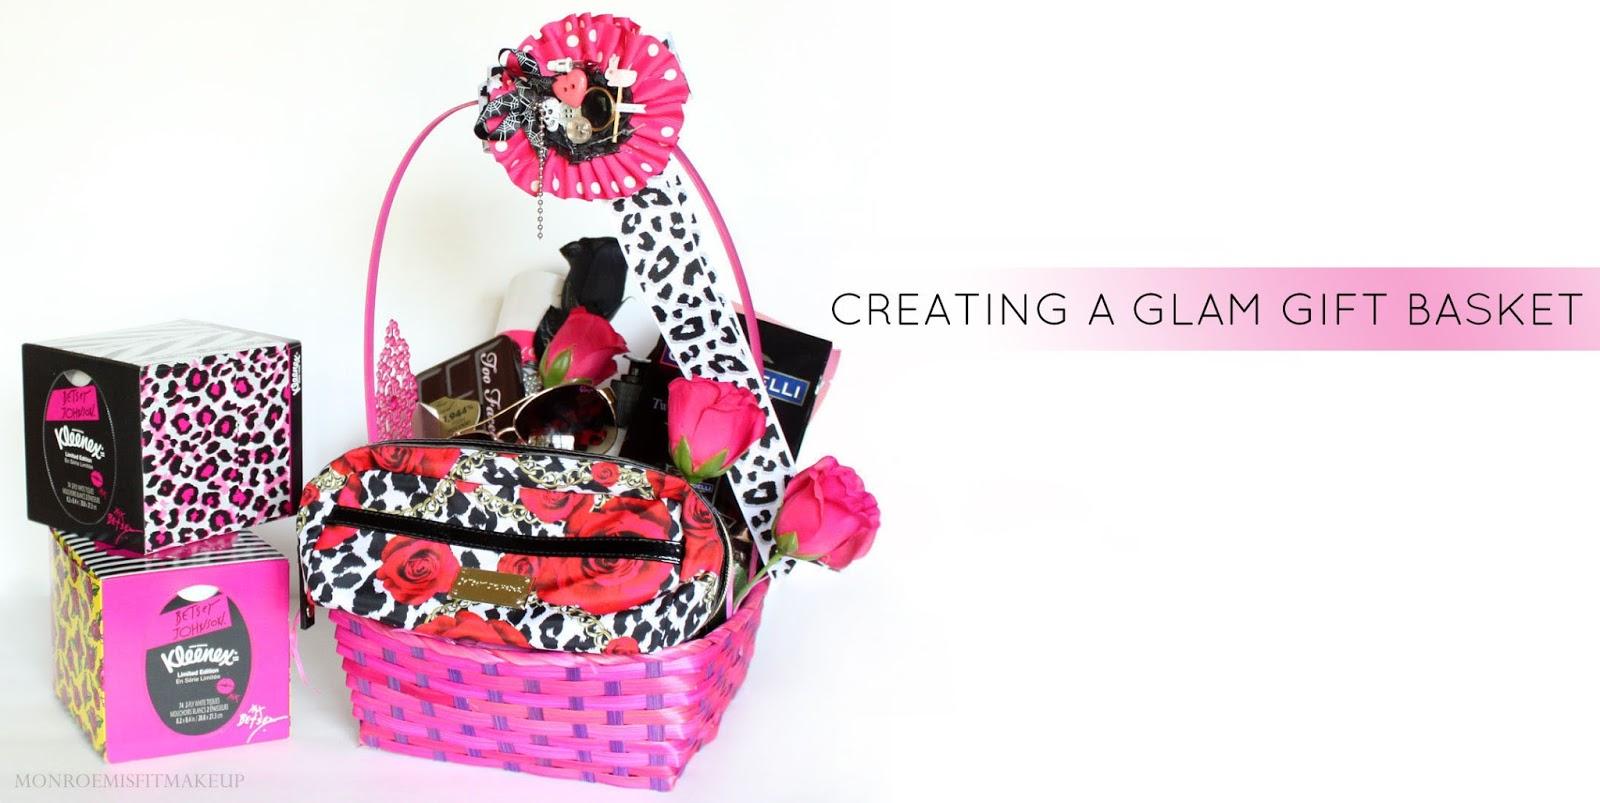 Monroe Misfit Makeup | Beauty Blog: Creating a Glam Gift Basket ...